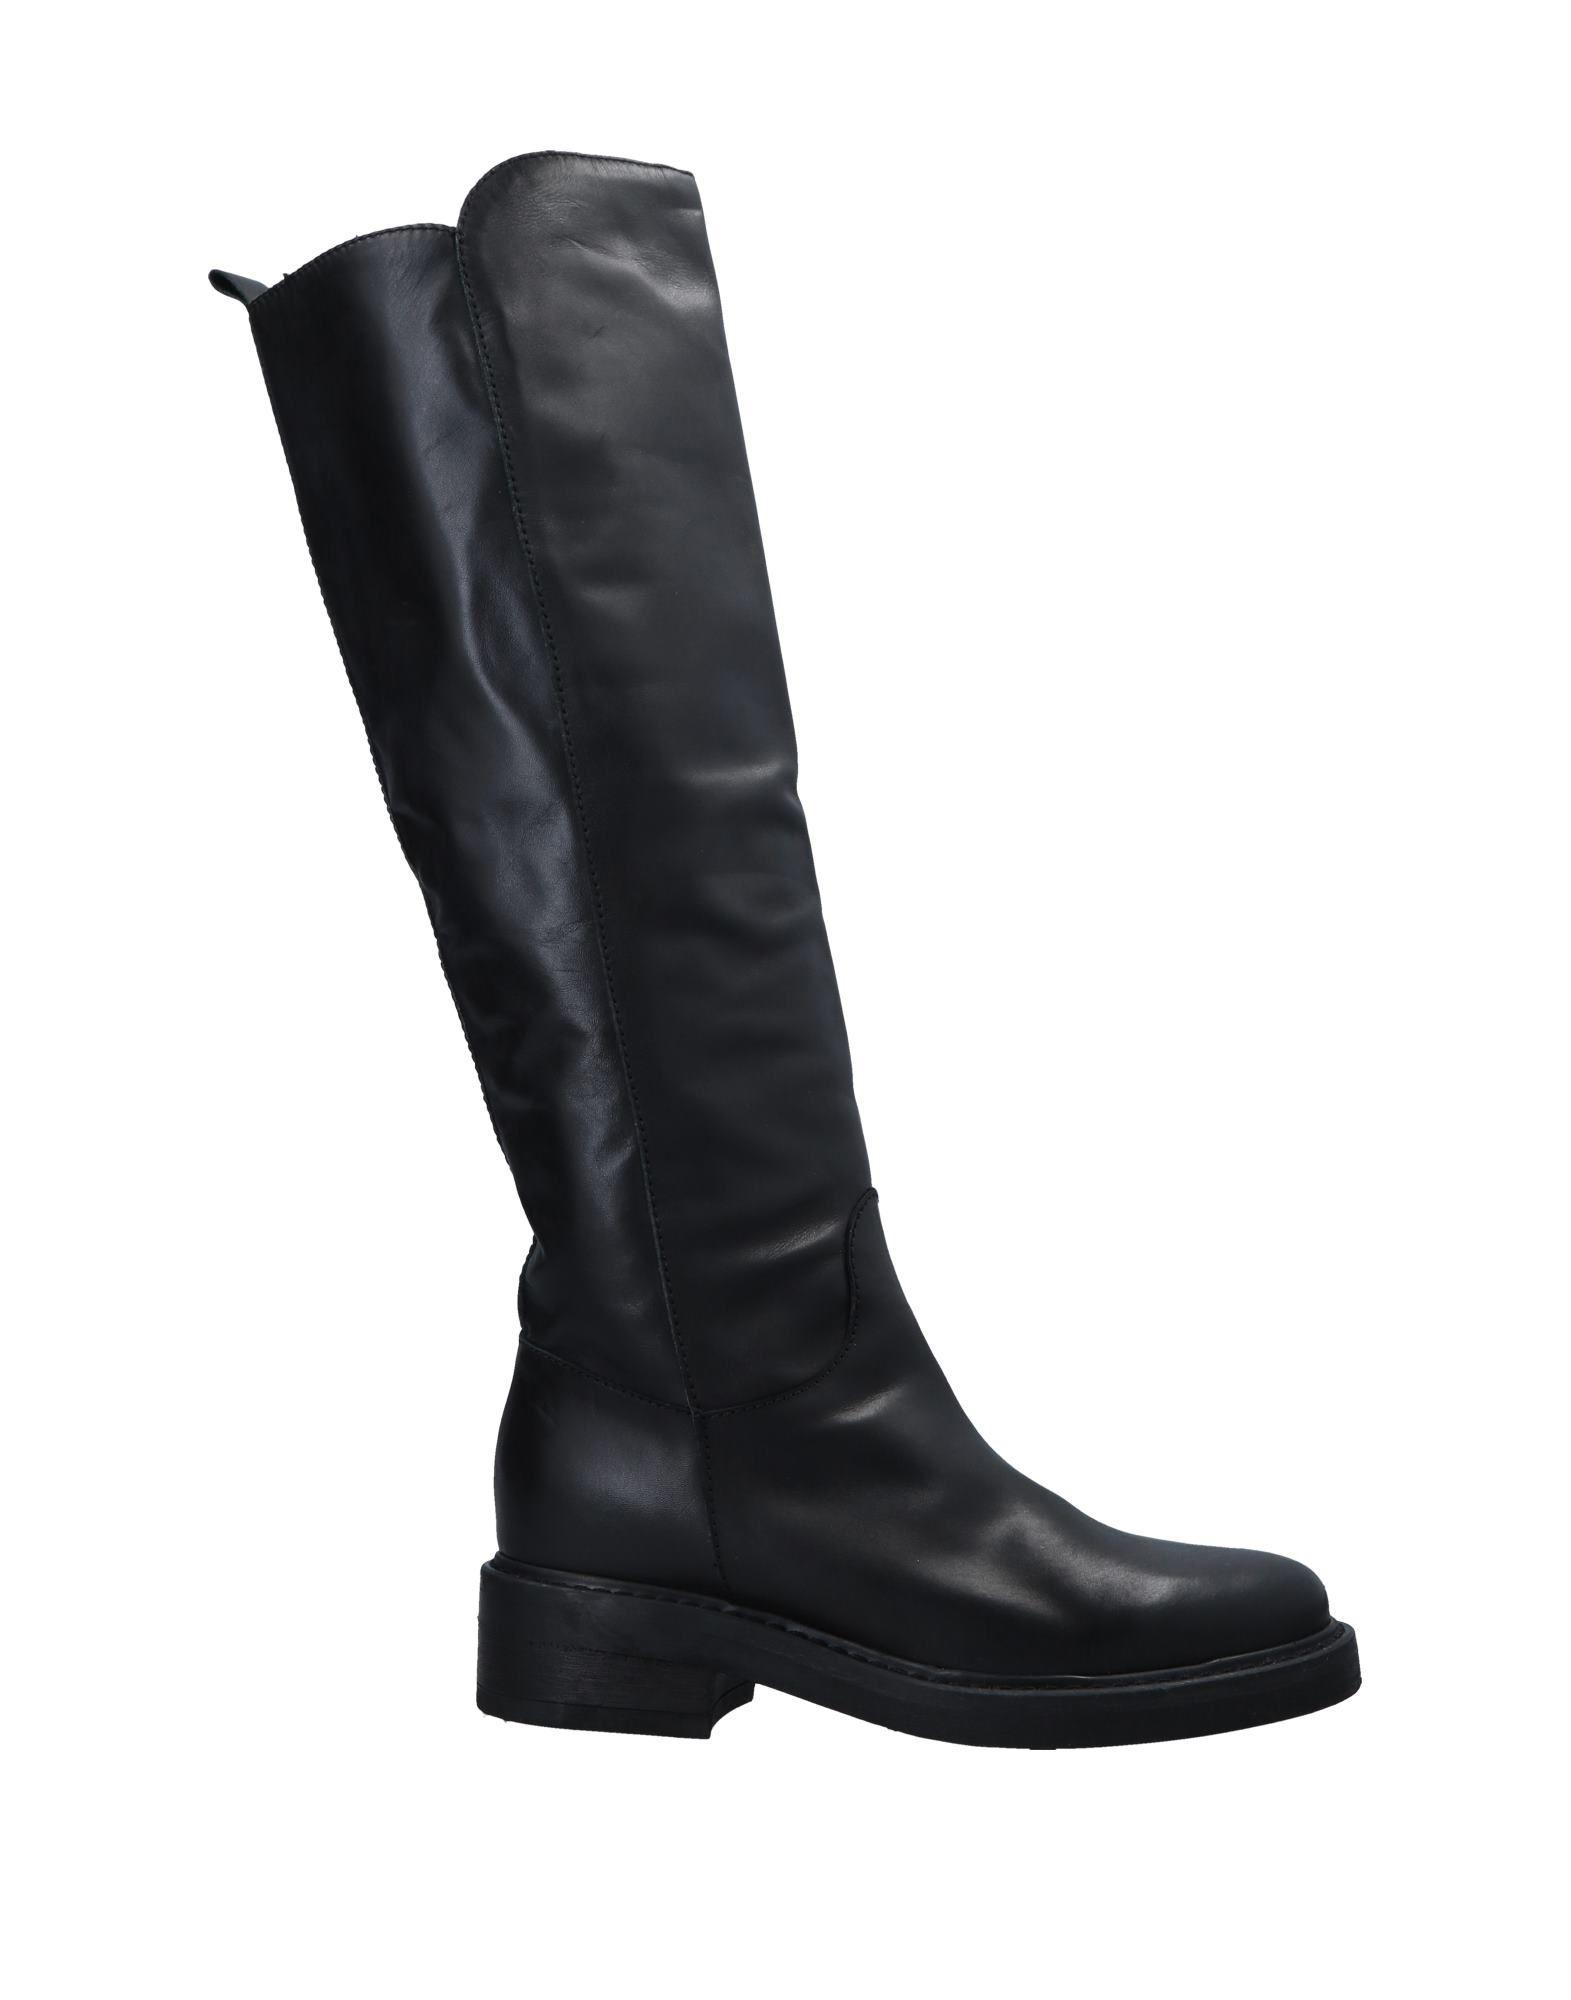 Gut um Stiefel billige Schuhe zu tragenSan Crispino Stiefel um Damen 11545839JX 2e78b0